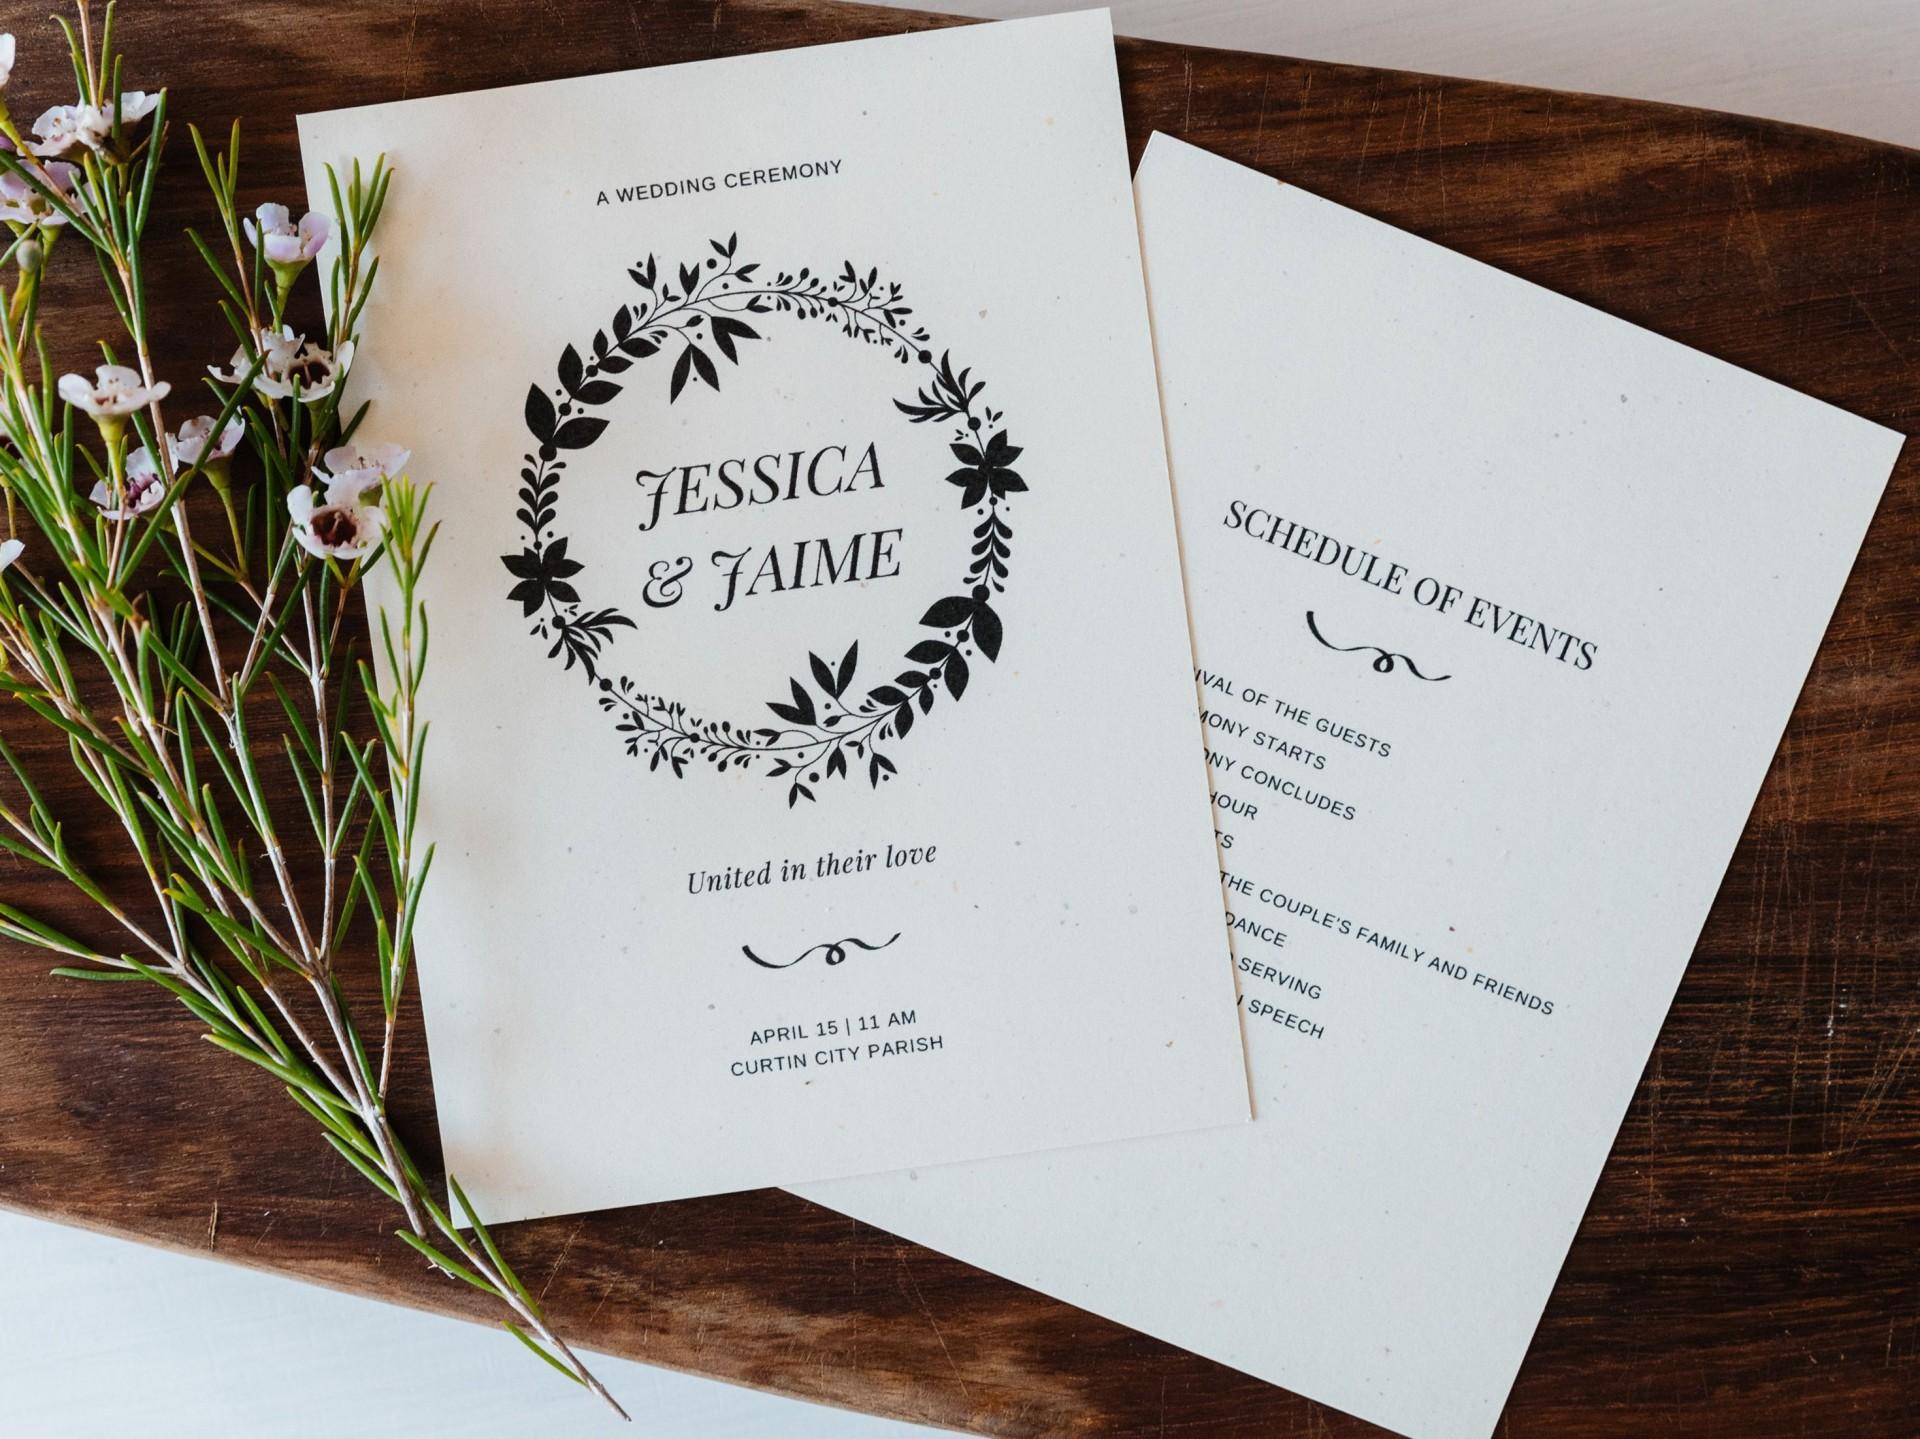 006 Stunning Trifold Wedding Program Template High Resolution  Tri Fold Word Folded Example1920